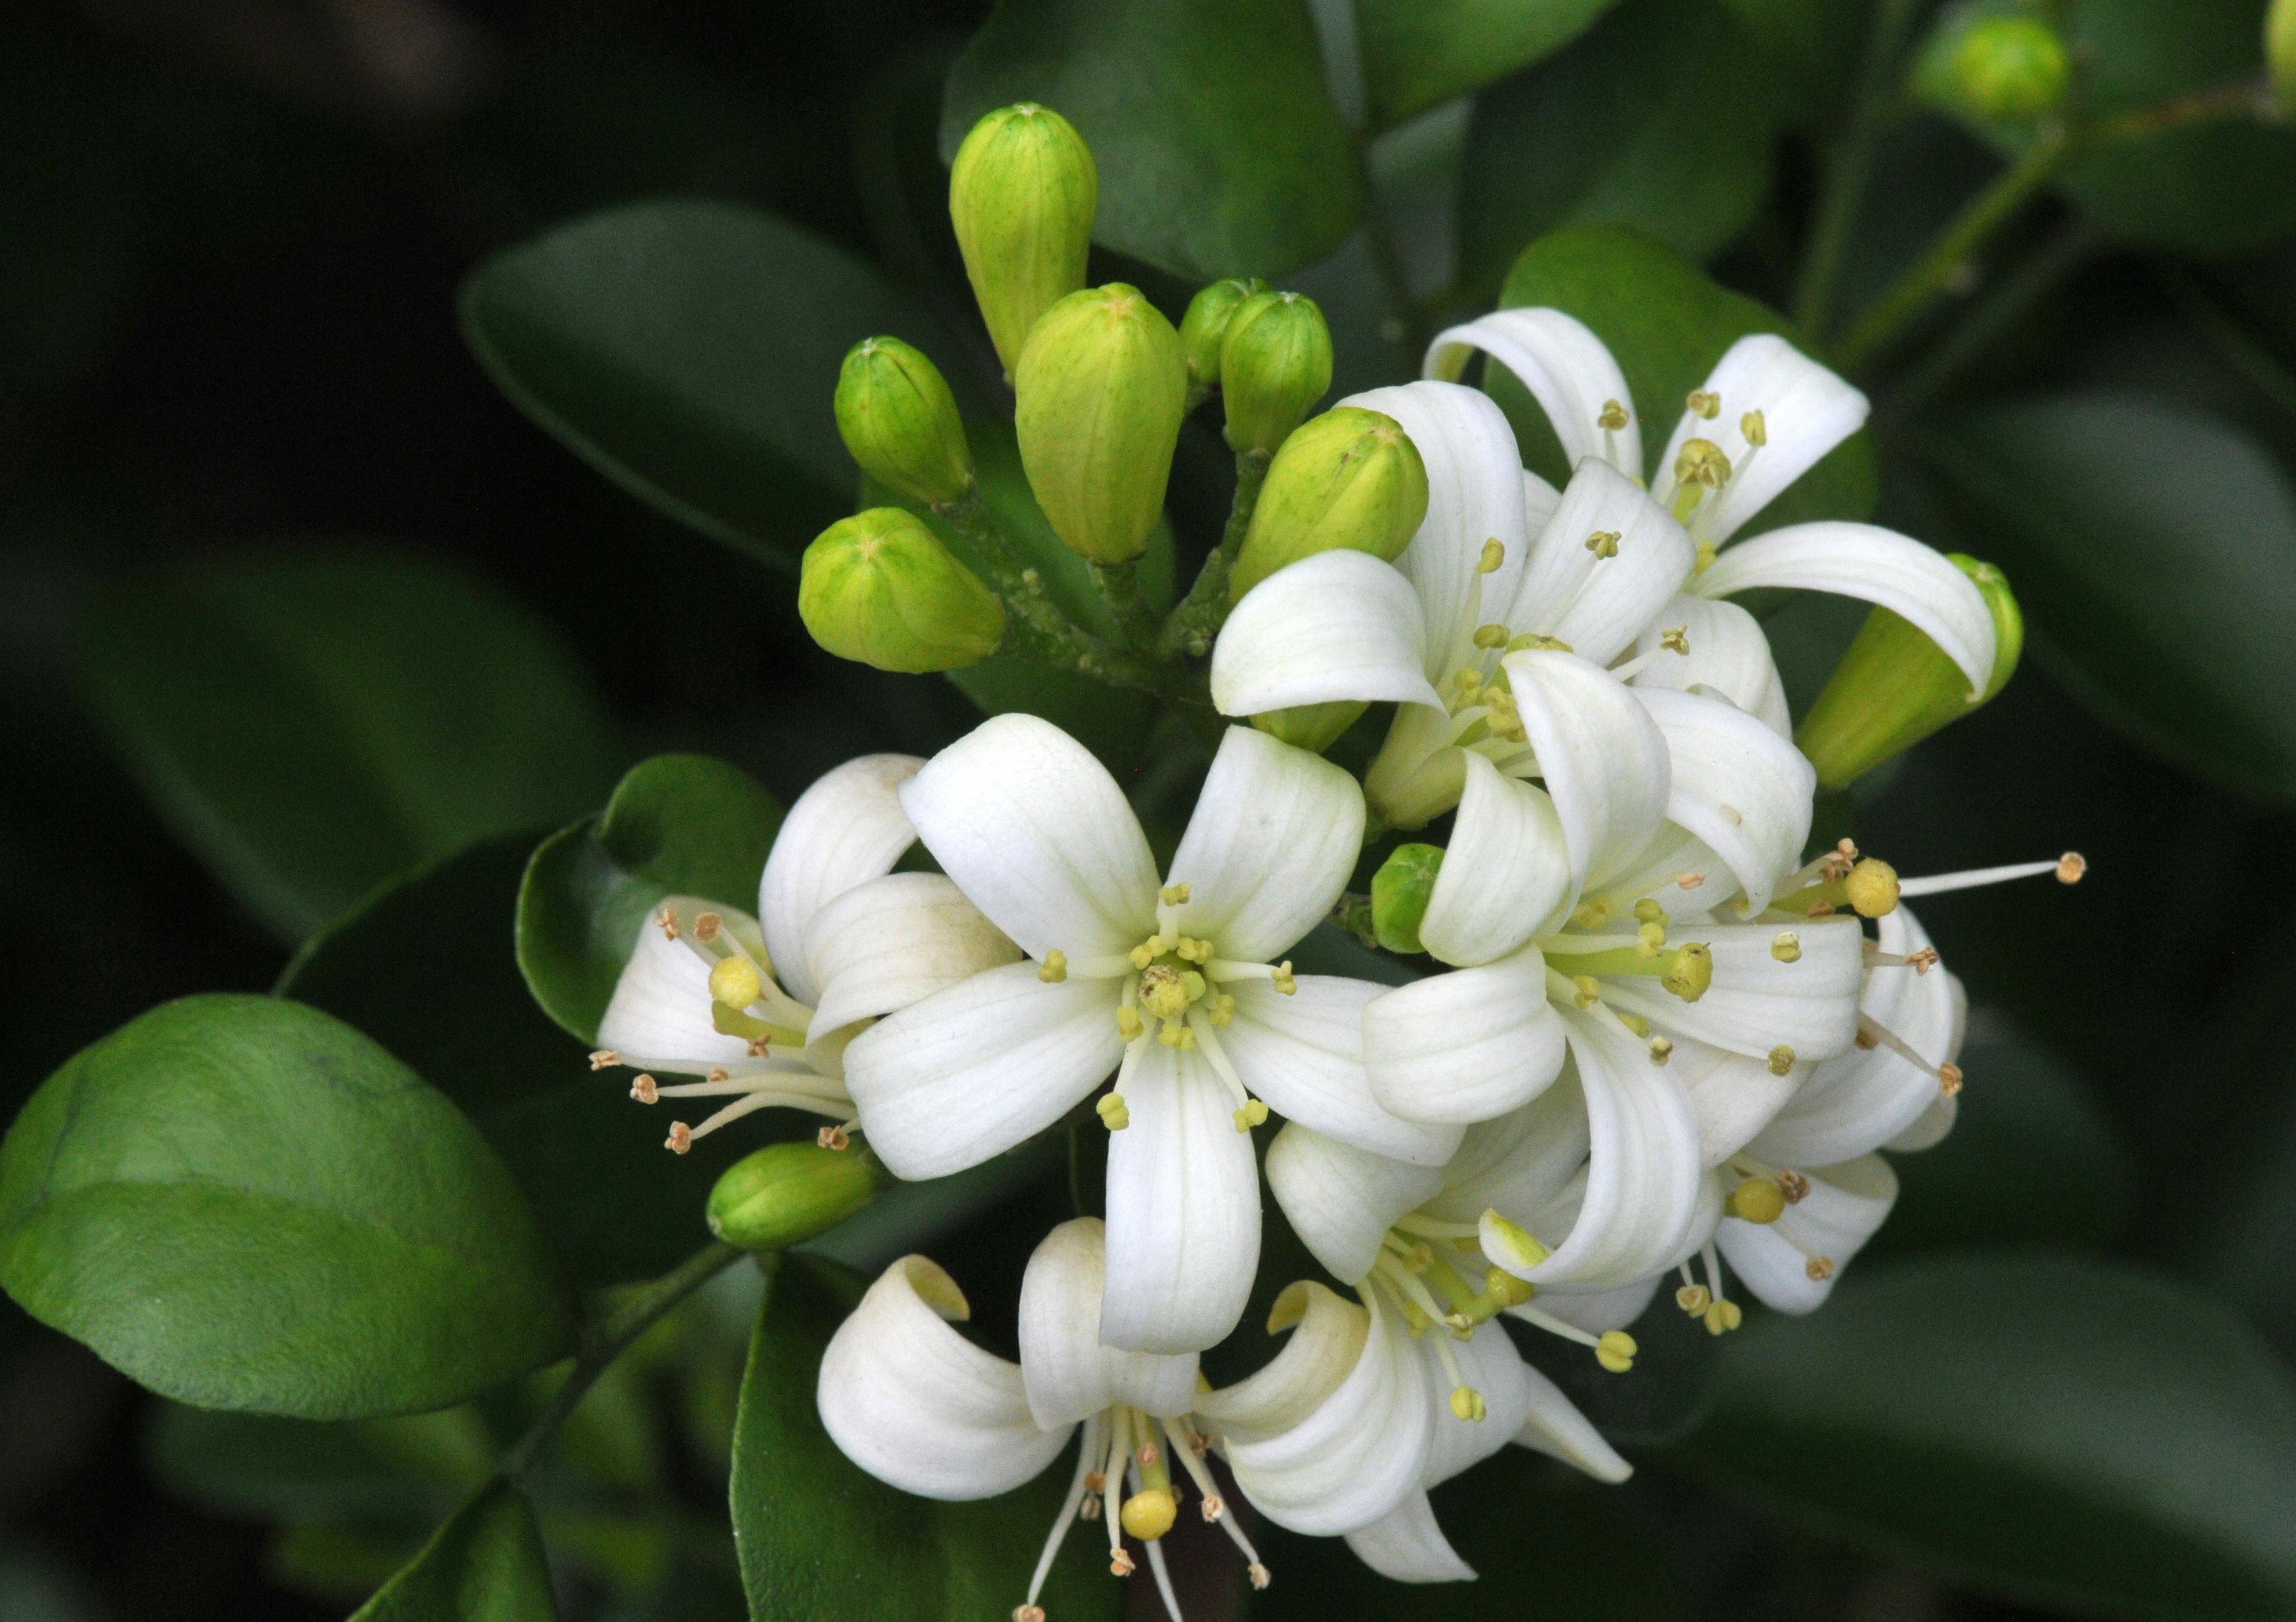 Belle of India jasmine